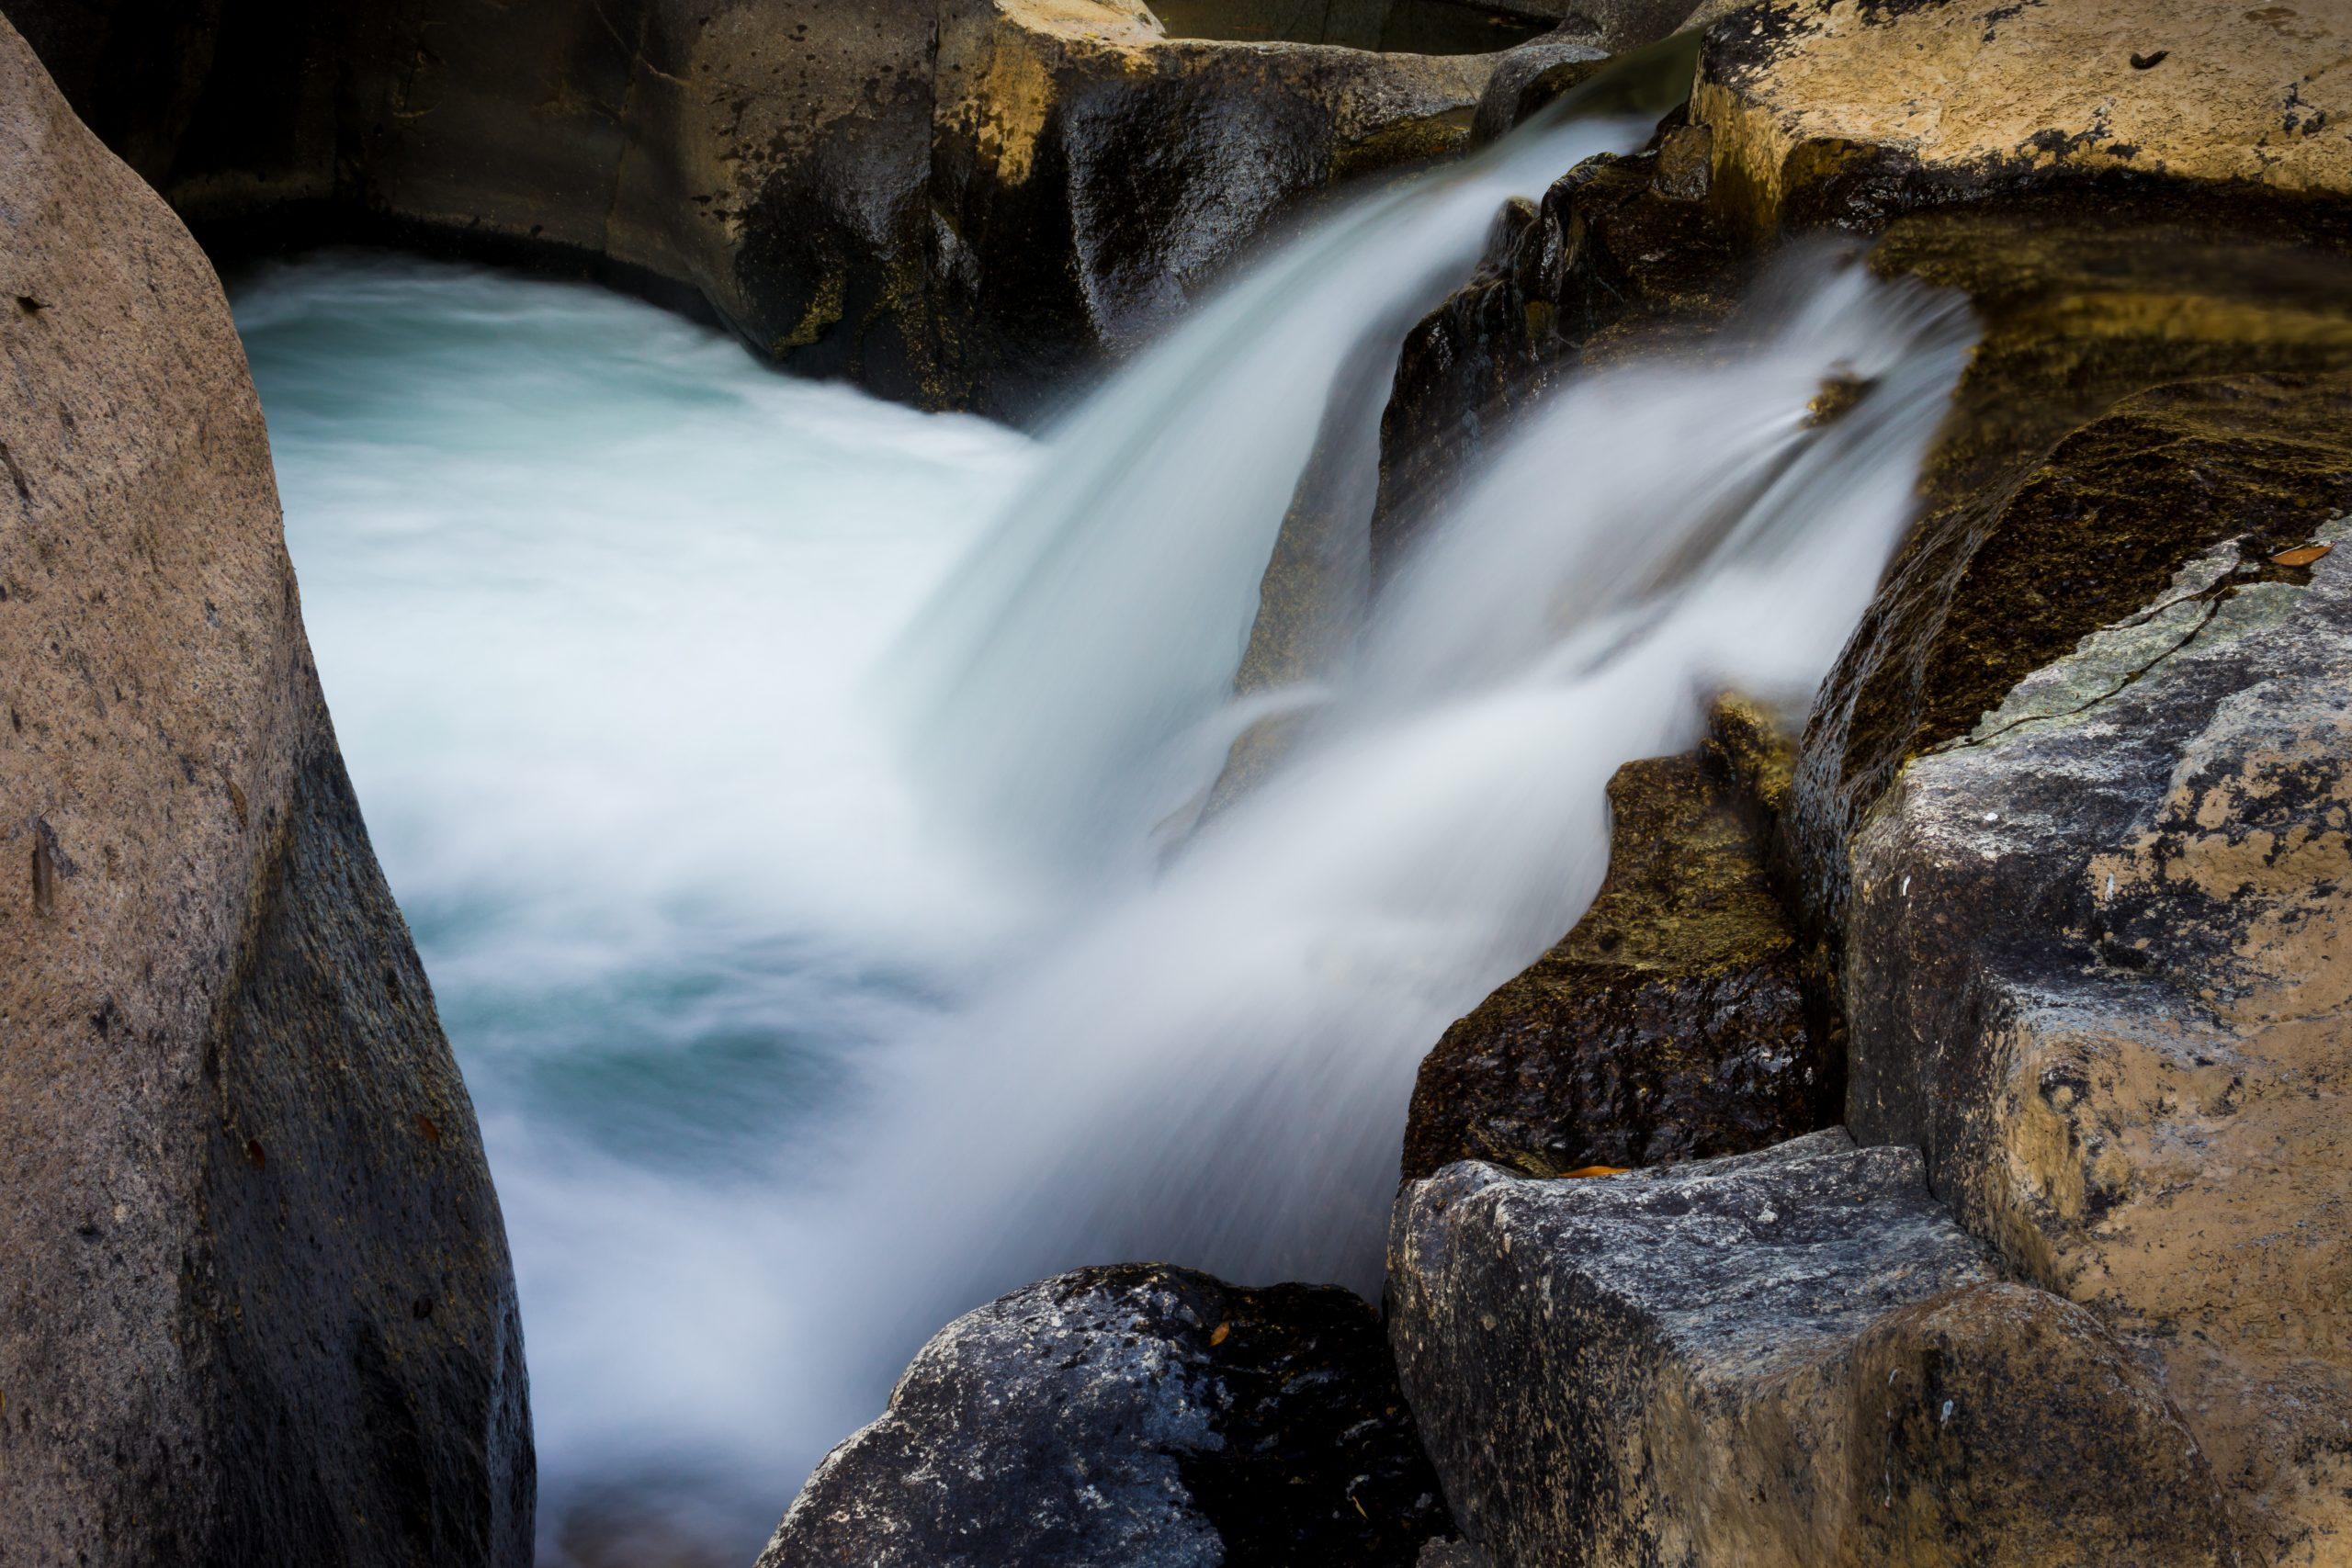 Beautiful waterfall and bedrock